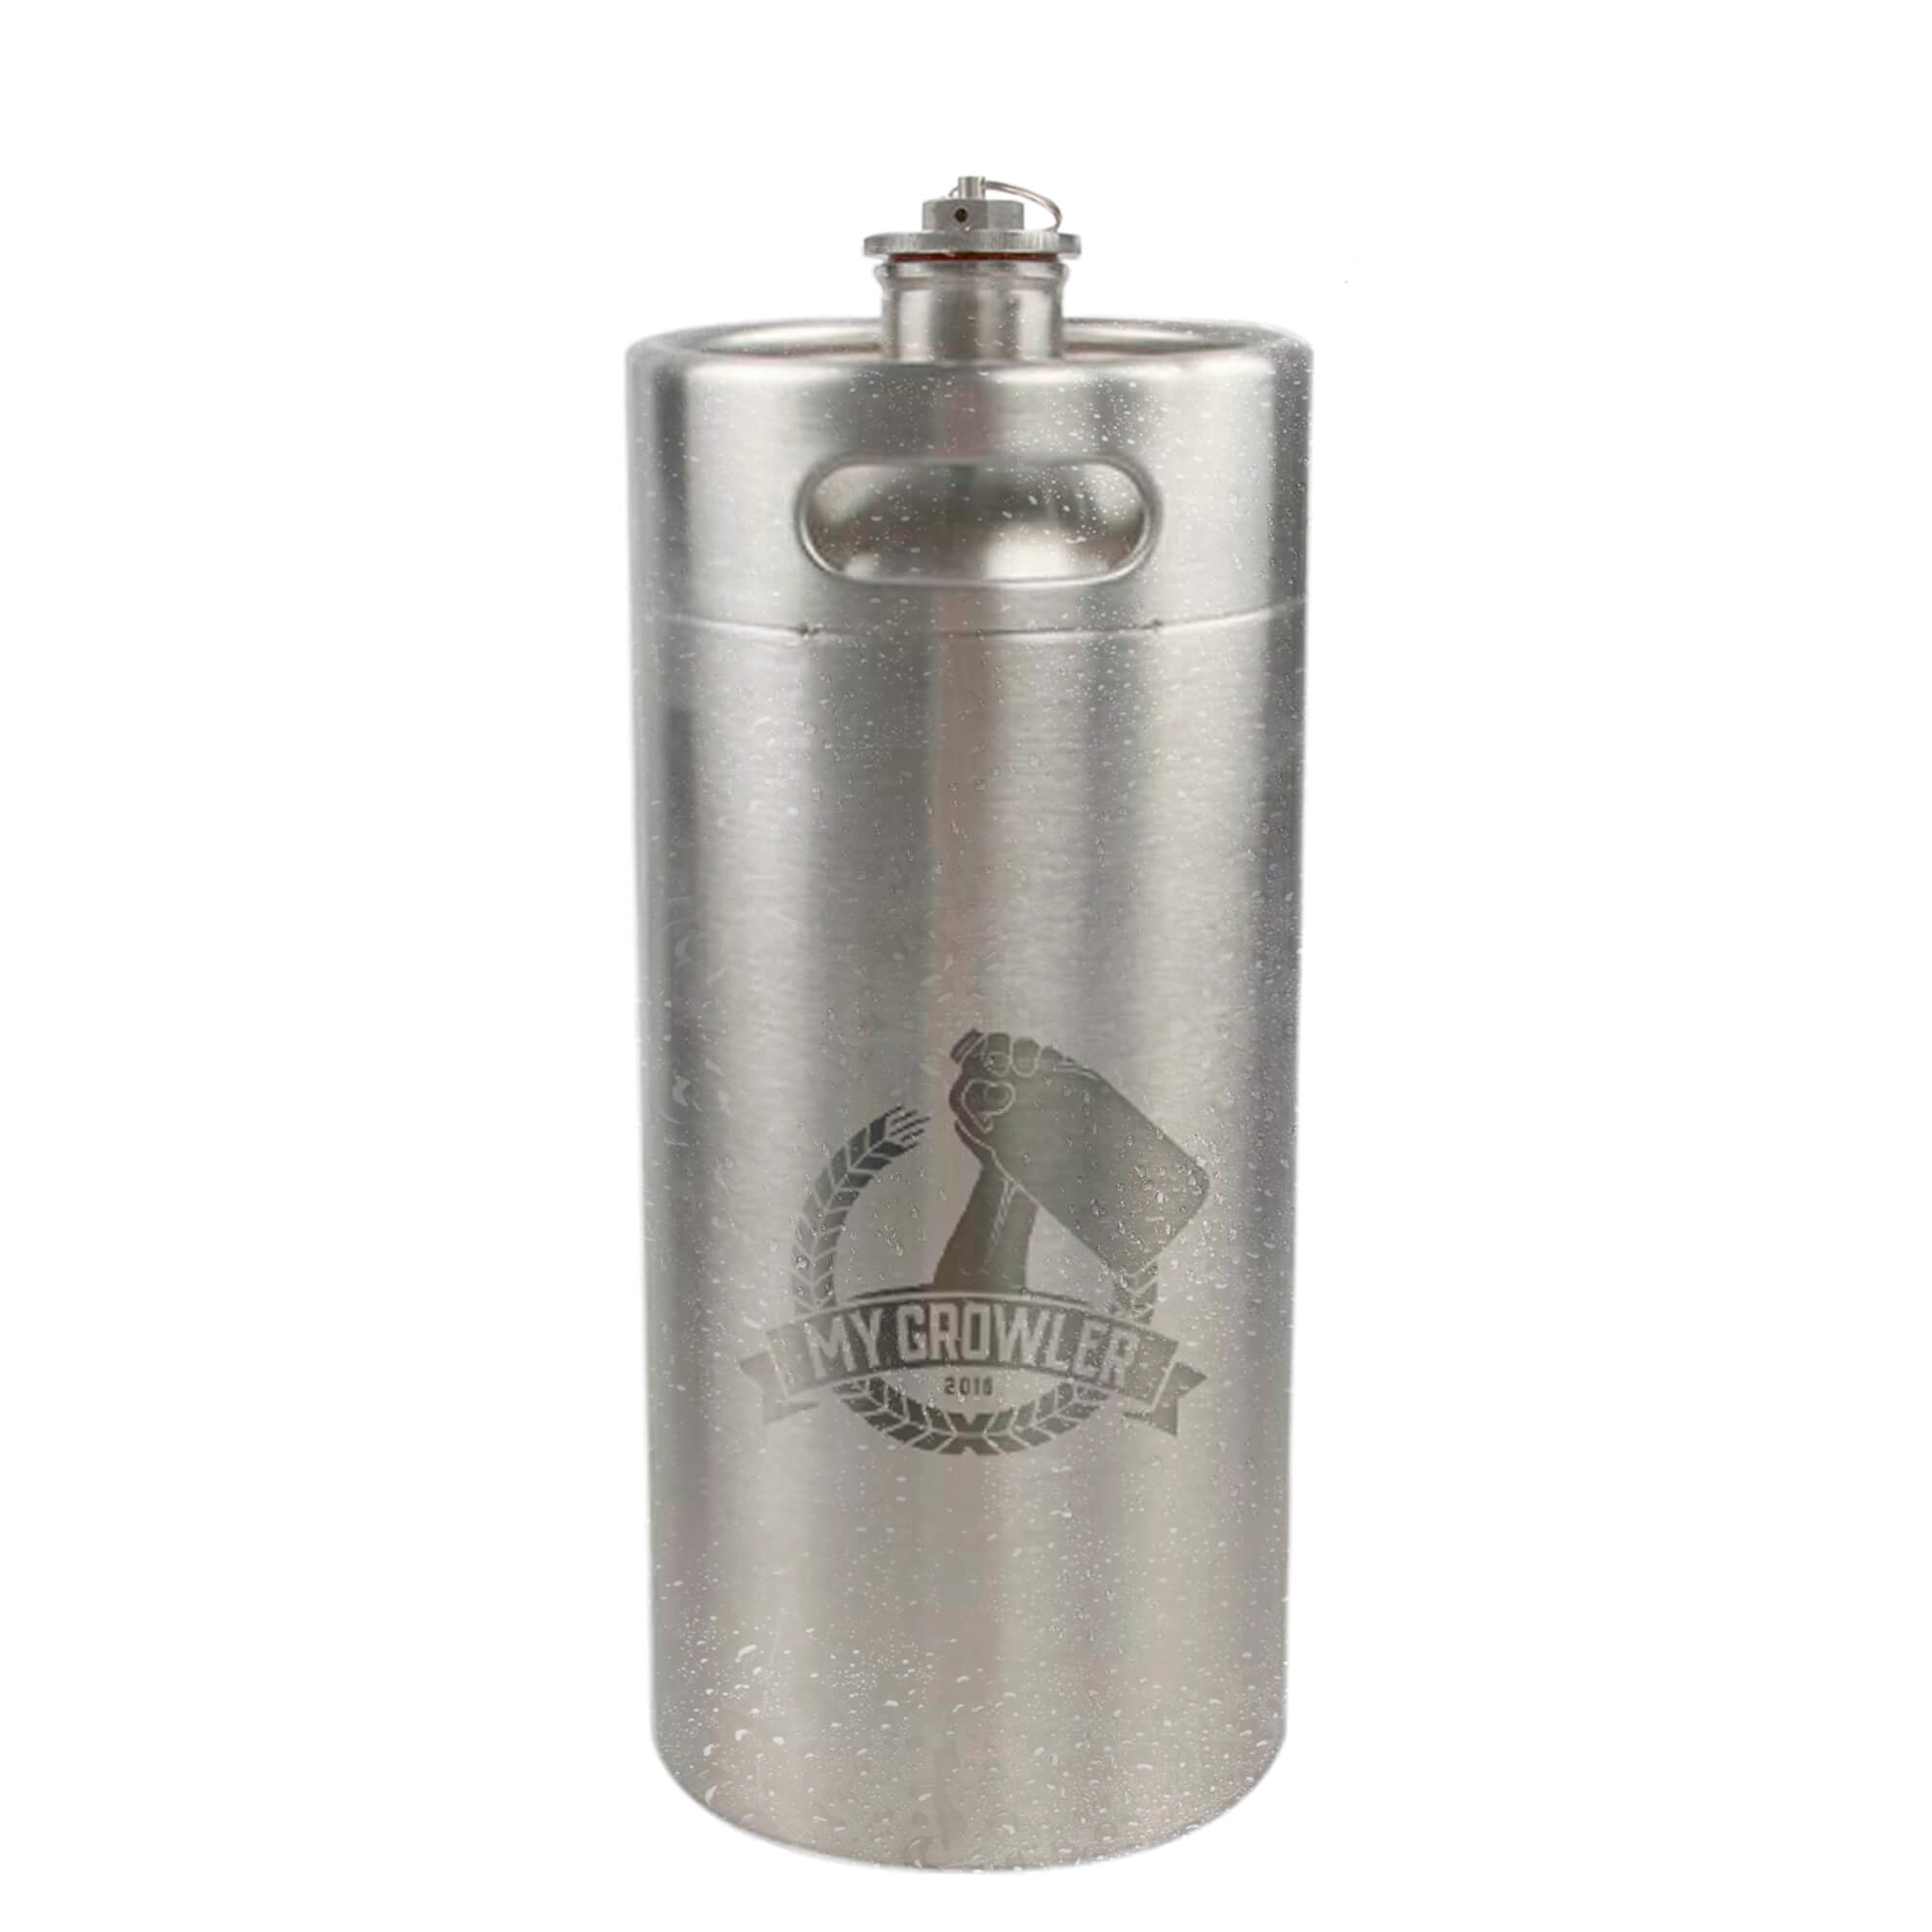 Mini Keg de aço inox 4L My Growler